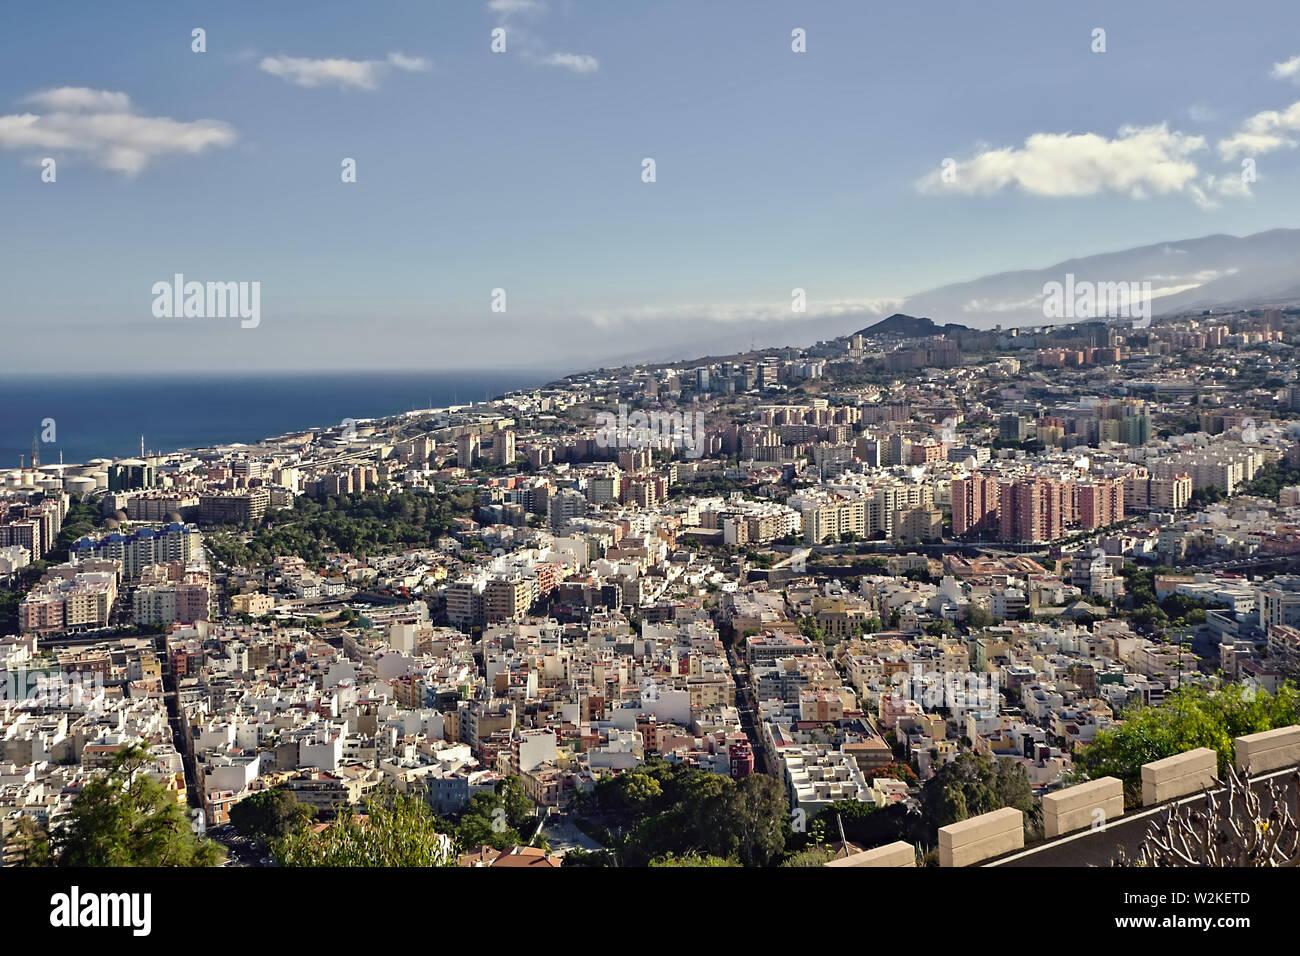 View of the capital Santa Cruz de Tenerife from the Mirador de los Campitos in the evening sun and blue sky. Stock Photo